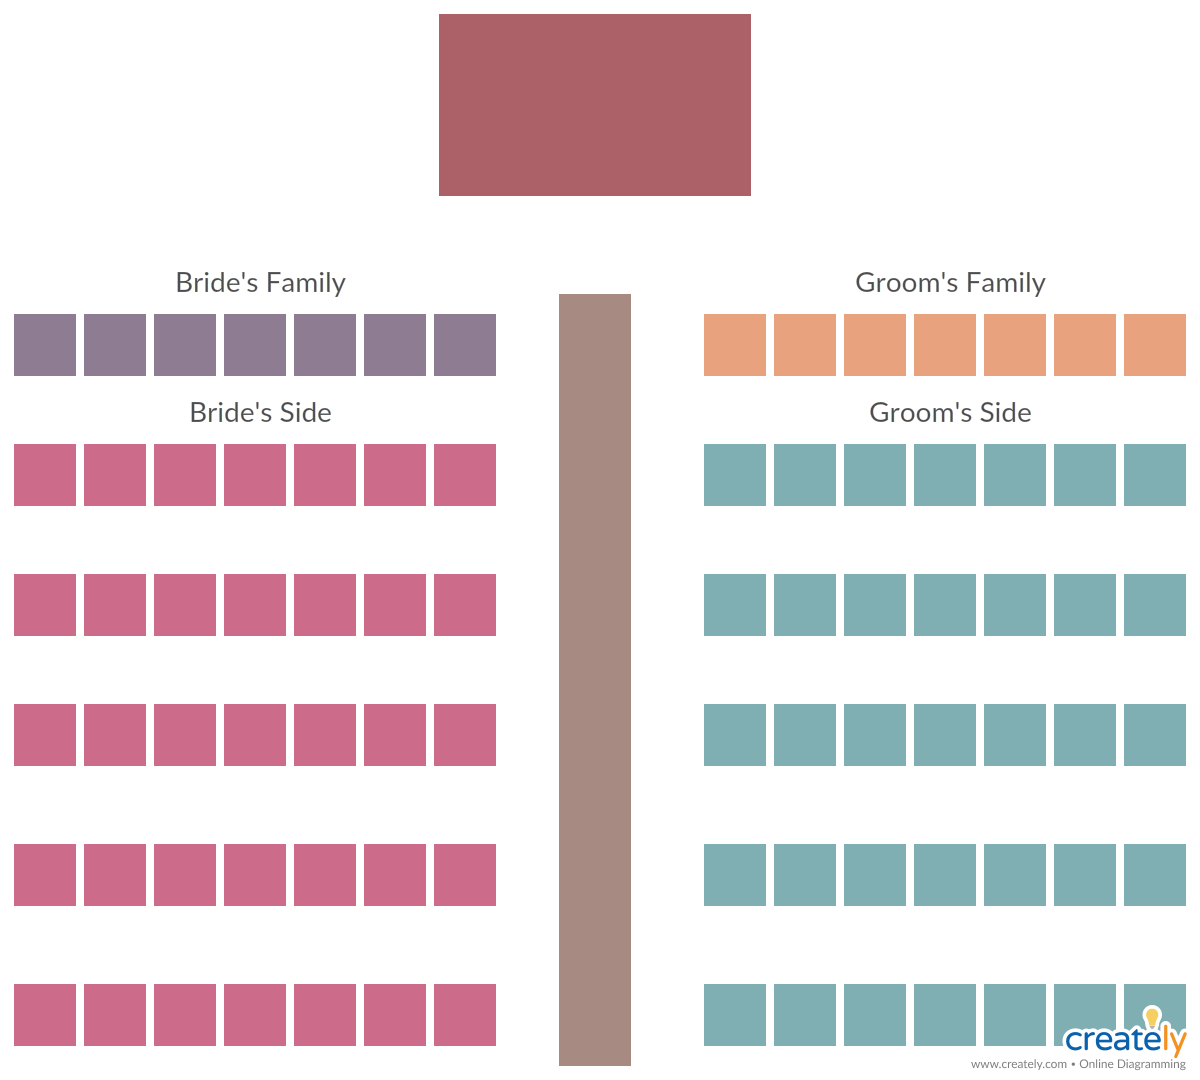 Wedding Ceremony Seating Template Wedding Ceremony Seating Planning Wedding Ceremony Seating Chart Wedding